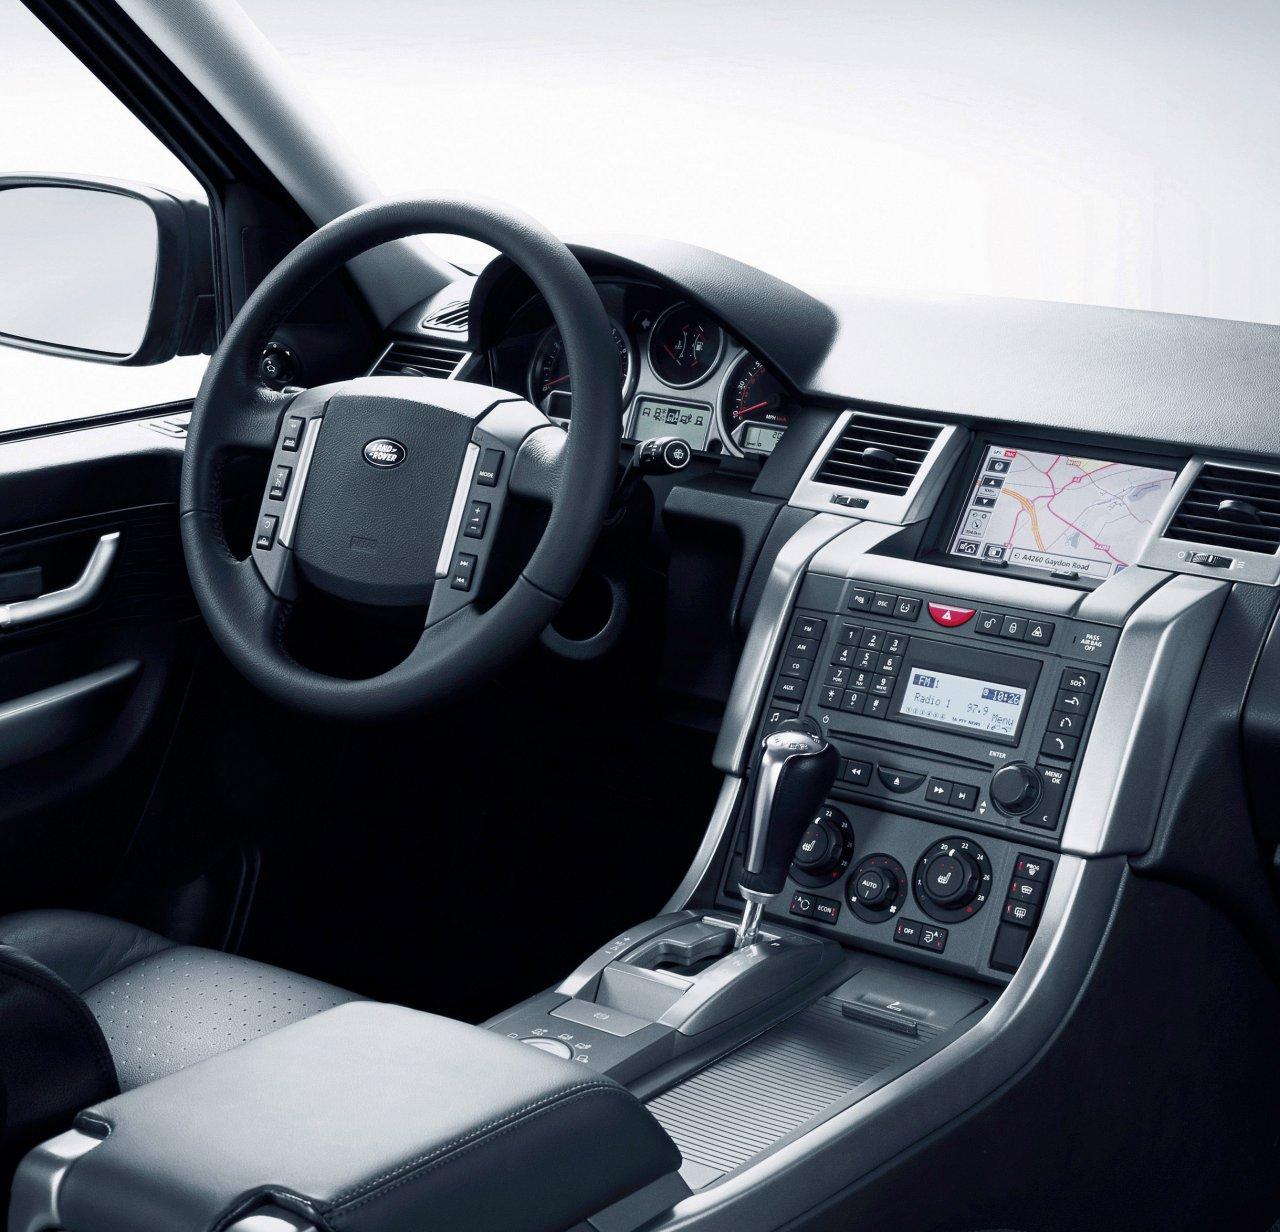 1997 Land Rover Discovery Interior: Web Rover